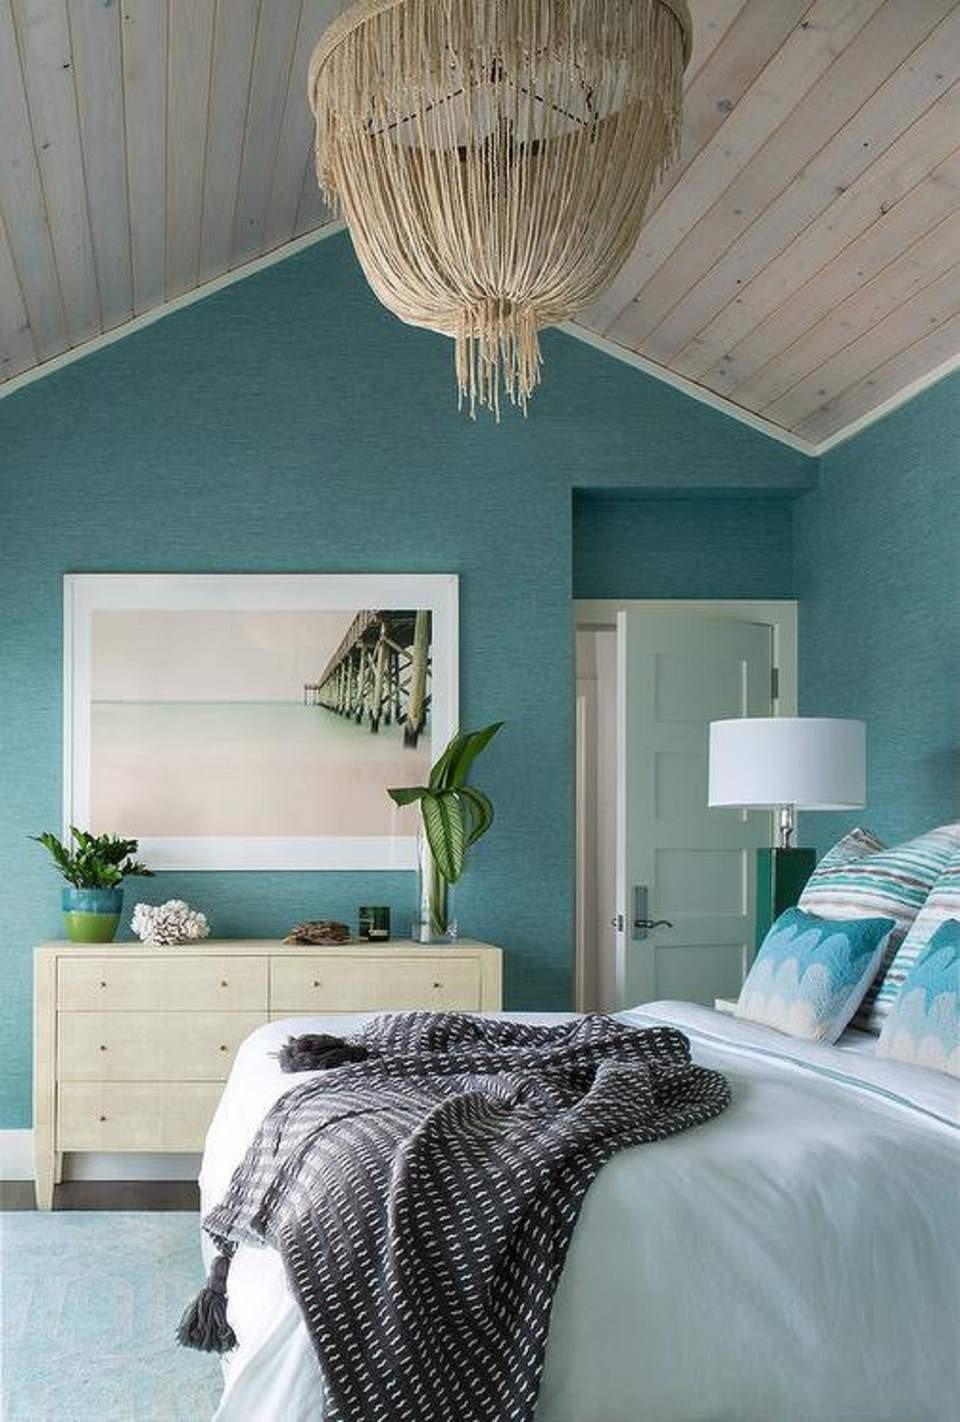 Beach theme Bedroom Decor Best Of 50 Gorgeous Beach Bedroom Decor Ideas